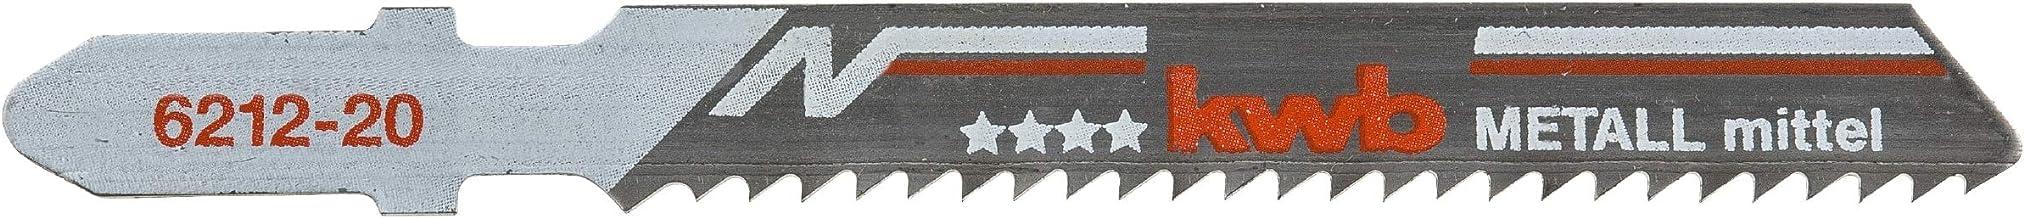 Einhell 49621220 Pack de 2 Sierra de calar para Metal, Med s20, Set de 2 Piezas